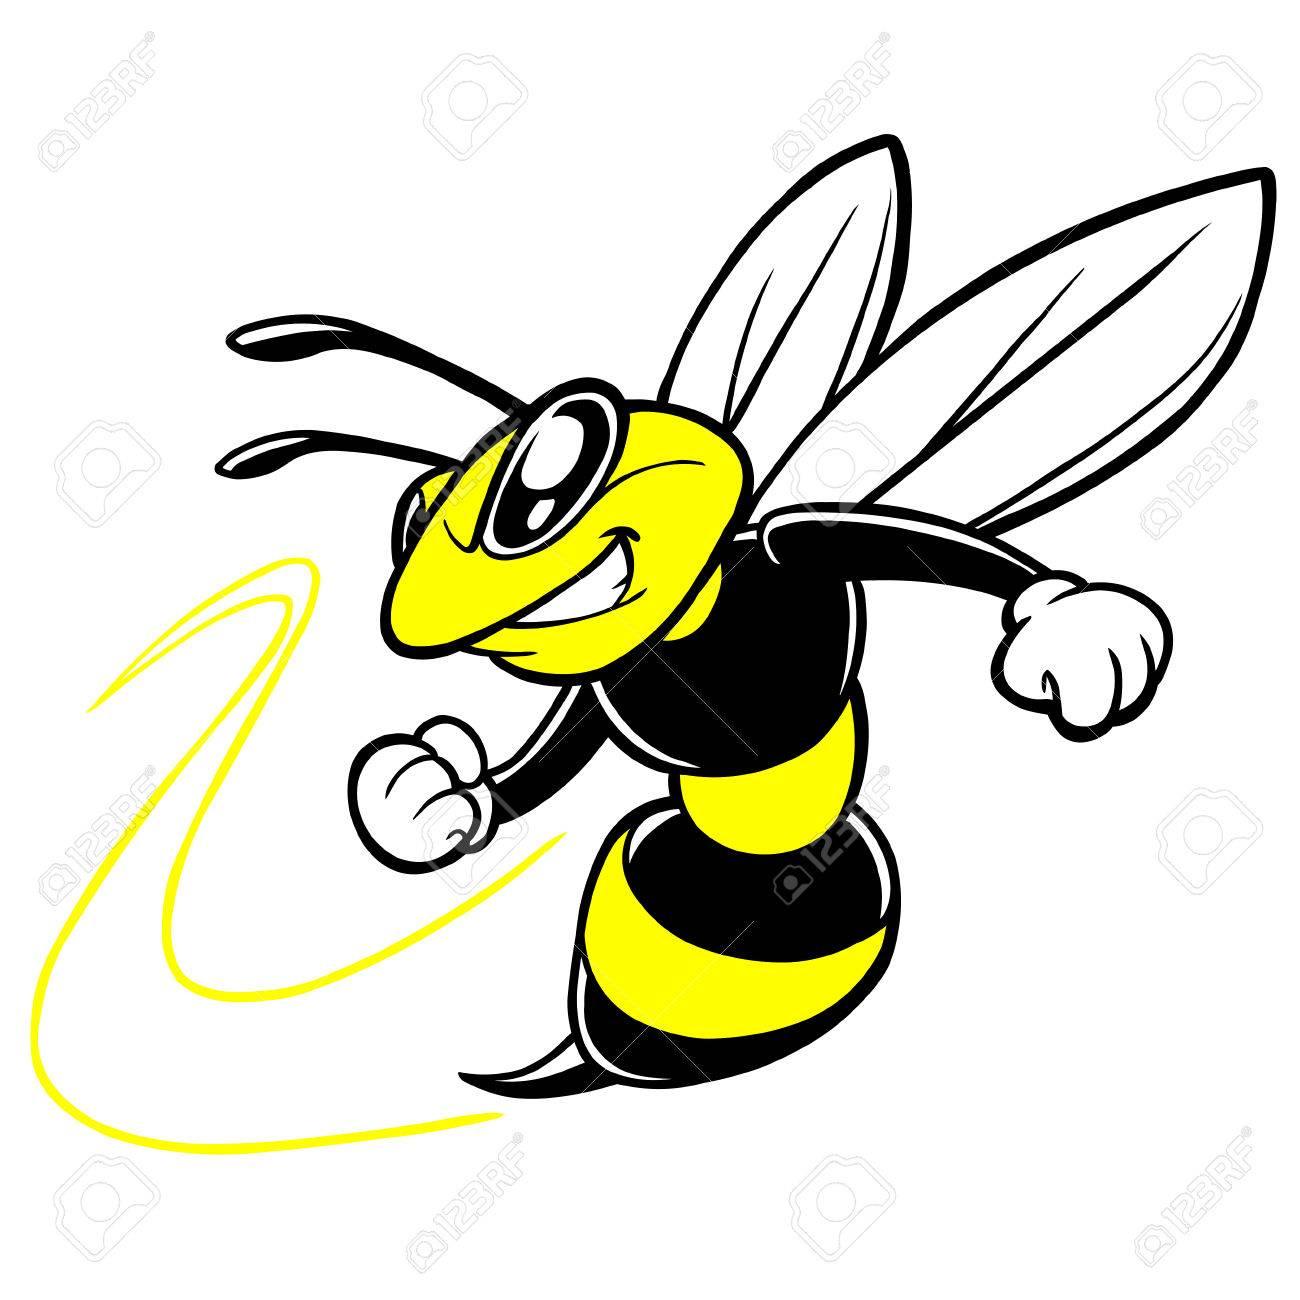 Bee Team Mascot - 57278640